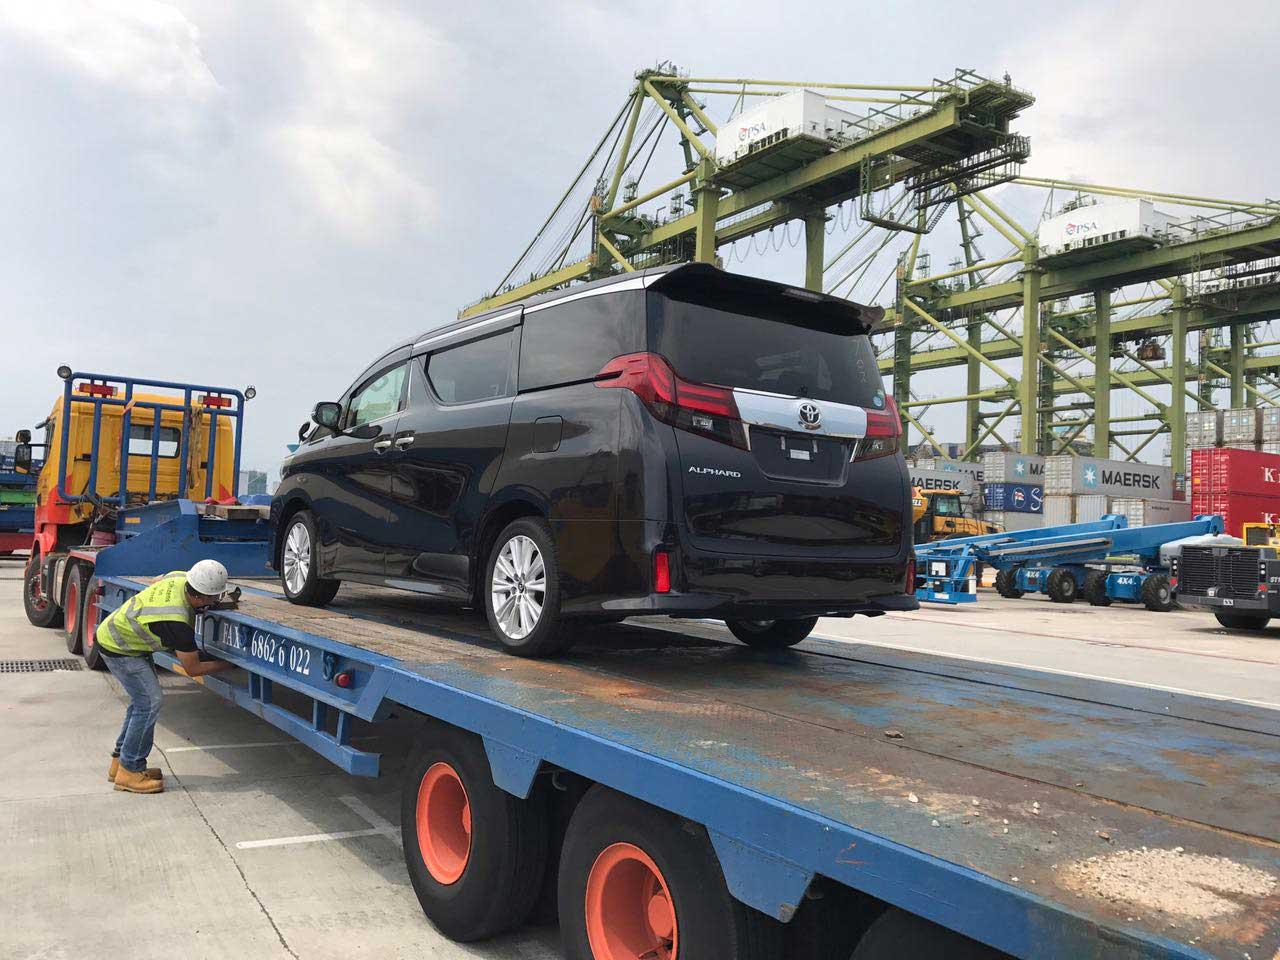 Import & Export Car to Overseas